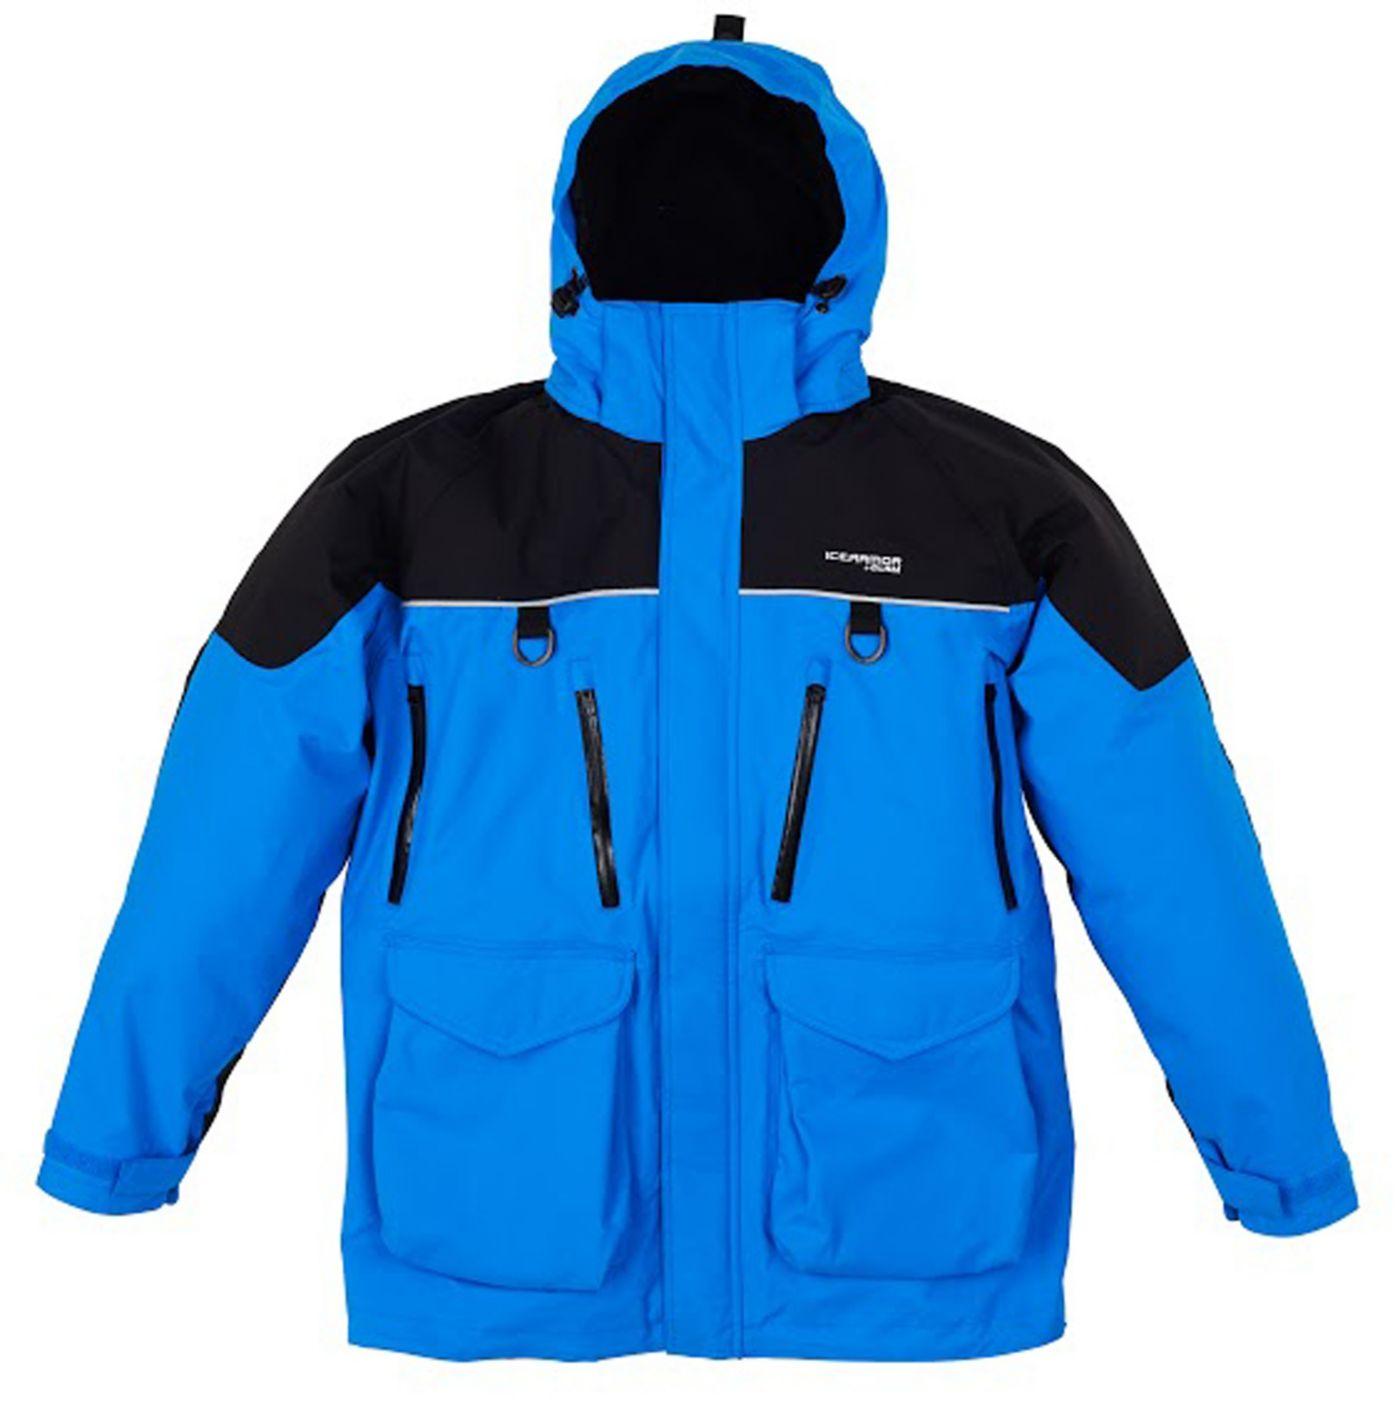 Clam IceArmor Men's Edge Cold Weather Parka